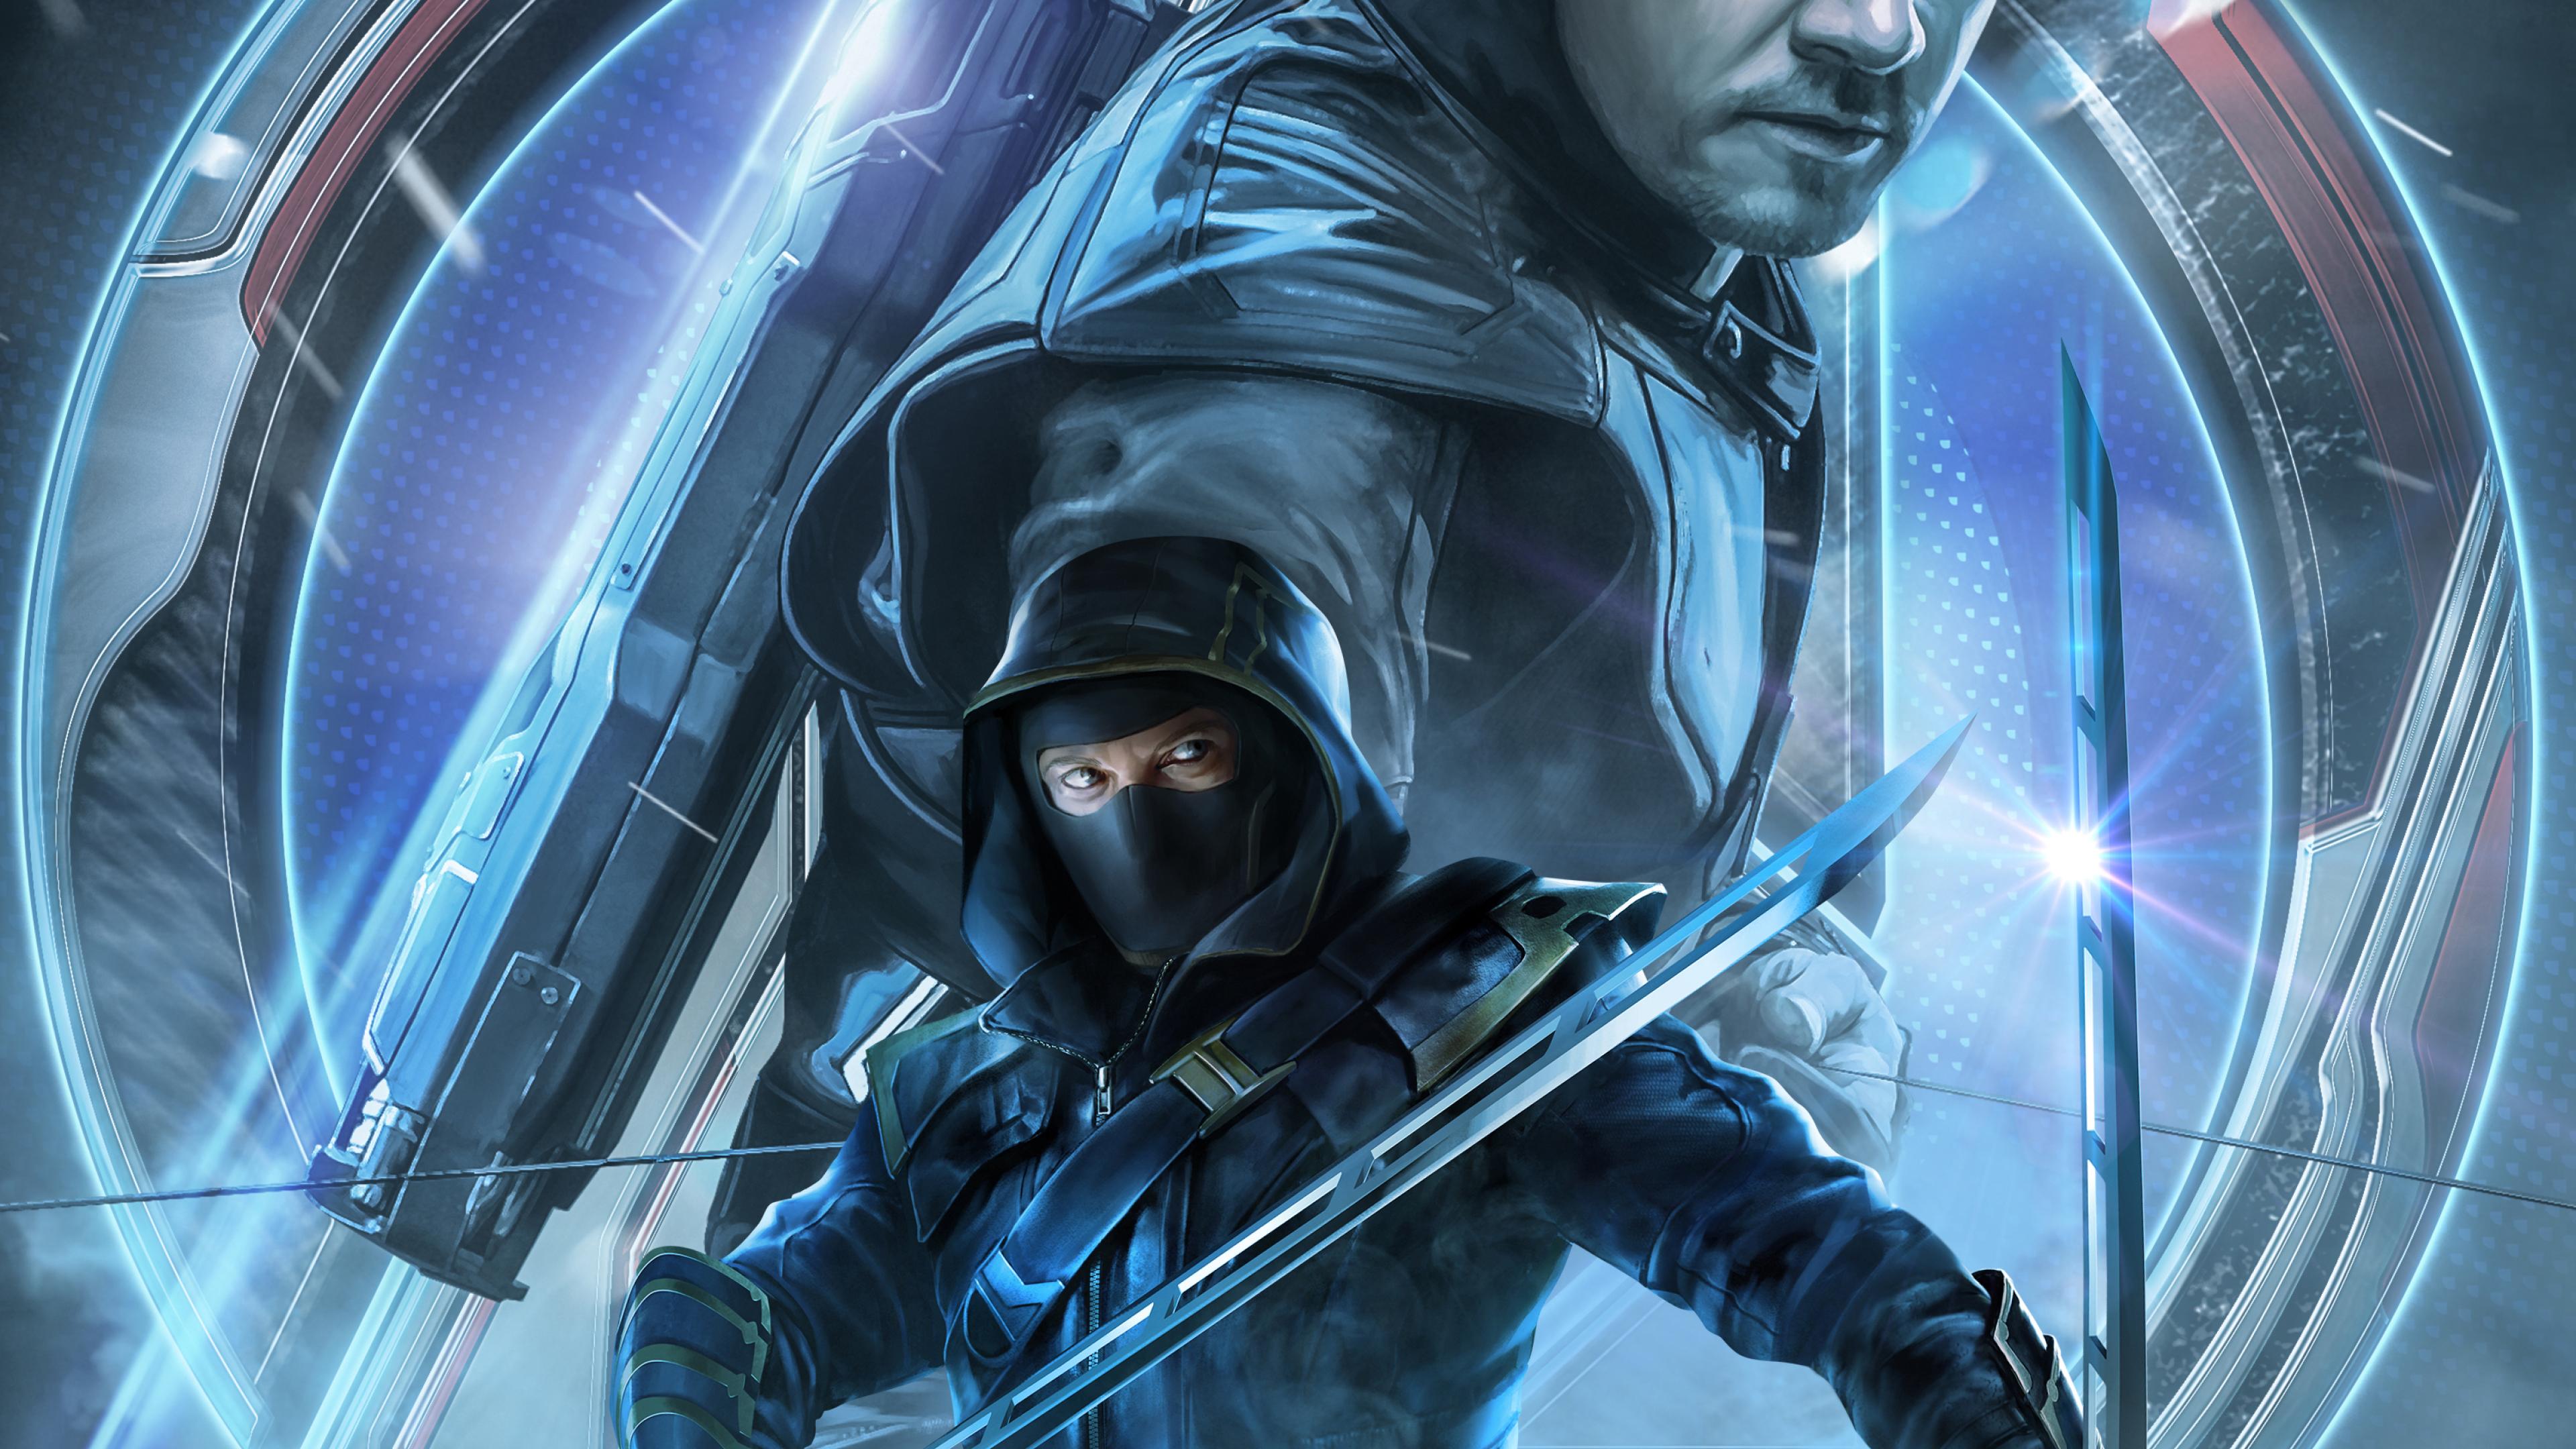 3840x2160 Avengers Endgame Ronin Hawkeye Poster Key Art 4K 3840x2160